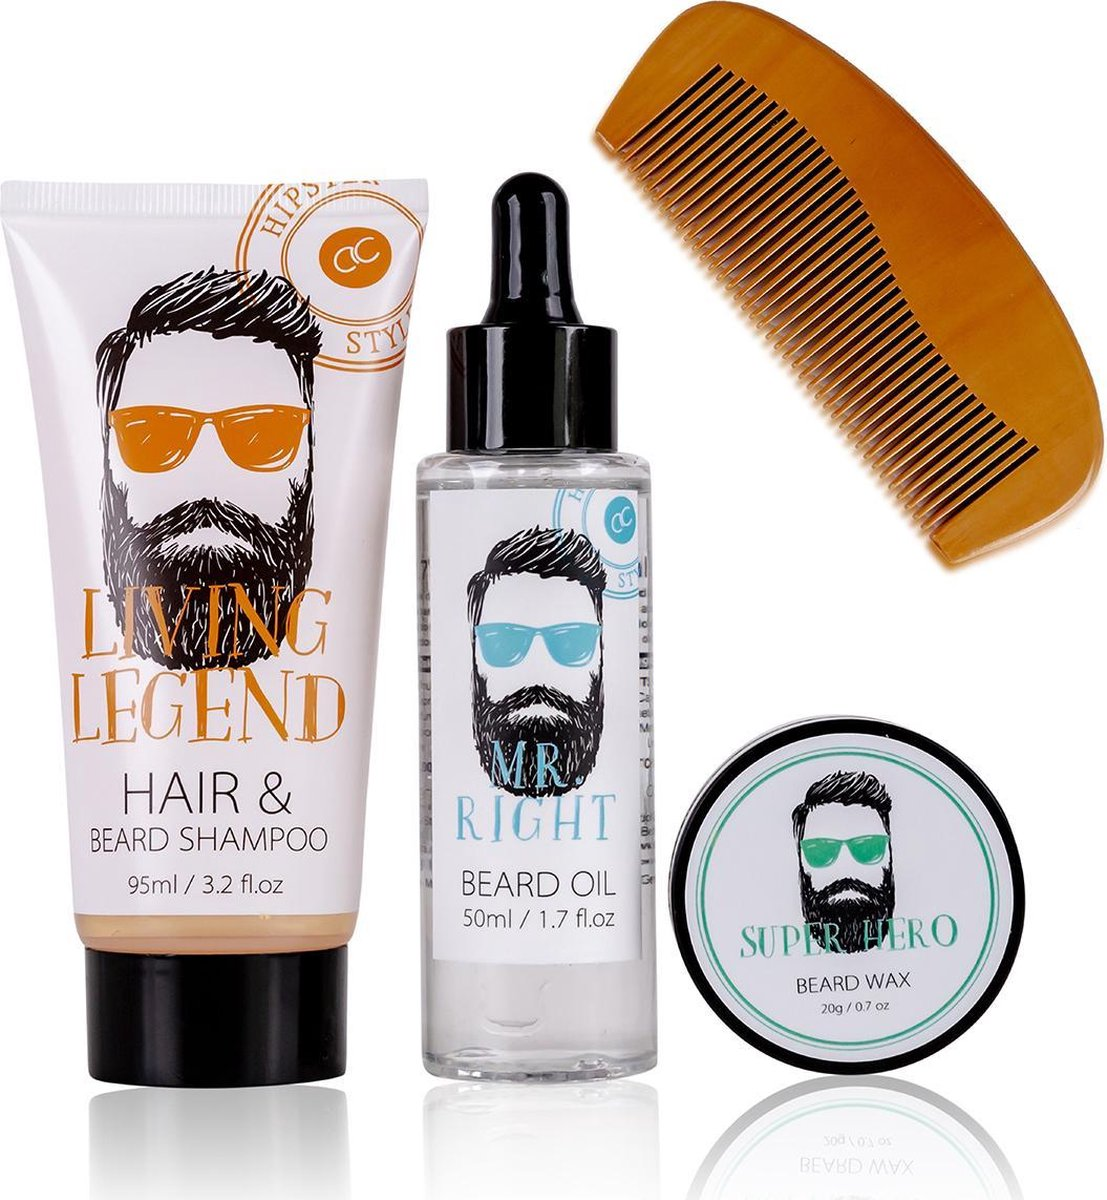 Baard verzorging set - Cadeau voor man - Oak & Citrus - HIPSTER STYLE - Baard shampoo, Baard olie, B